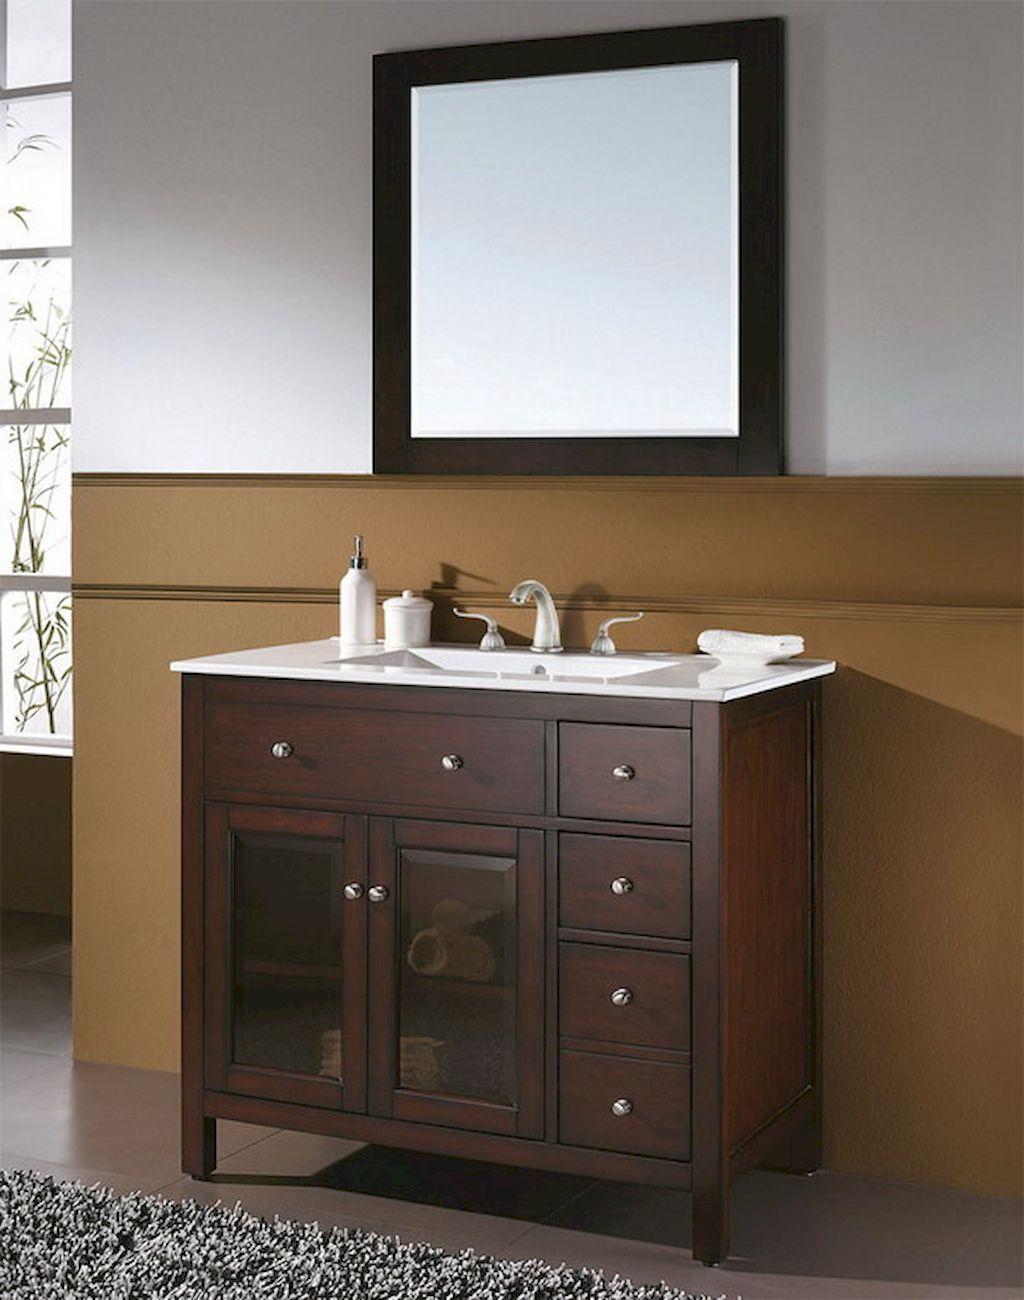 20 Easy Master Bathroom Organization Ideas   Bathroom vanity ...